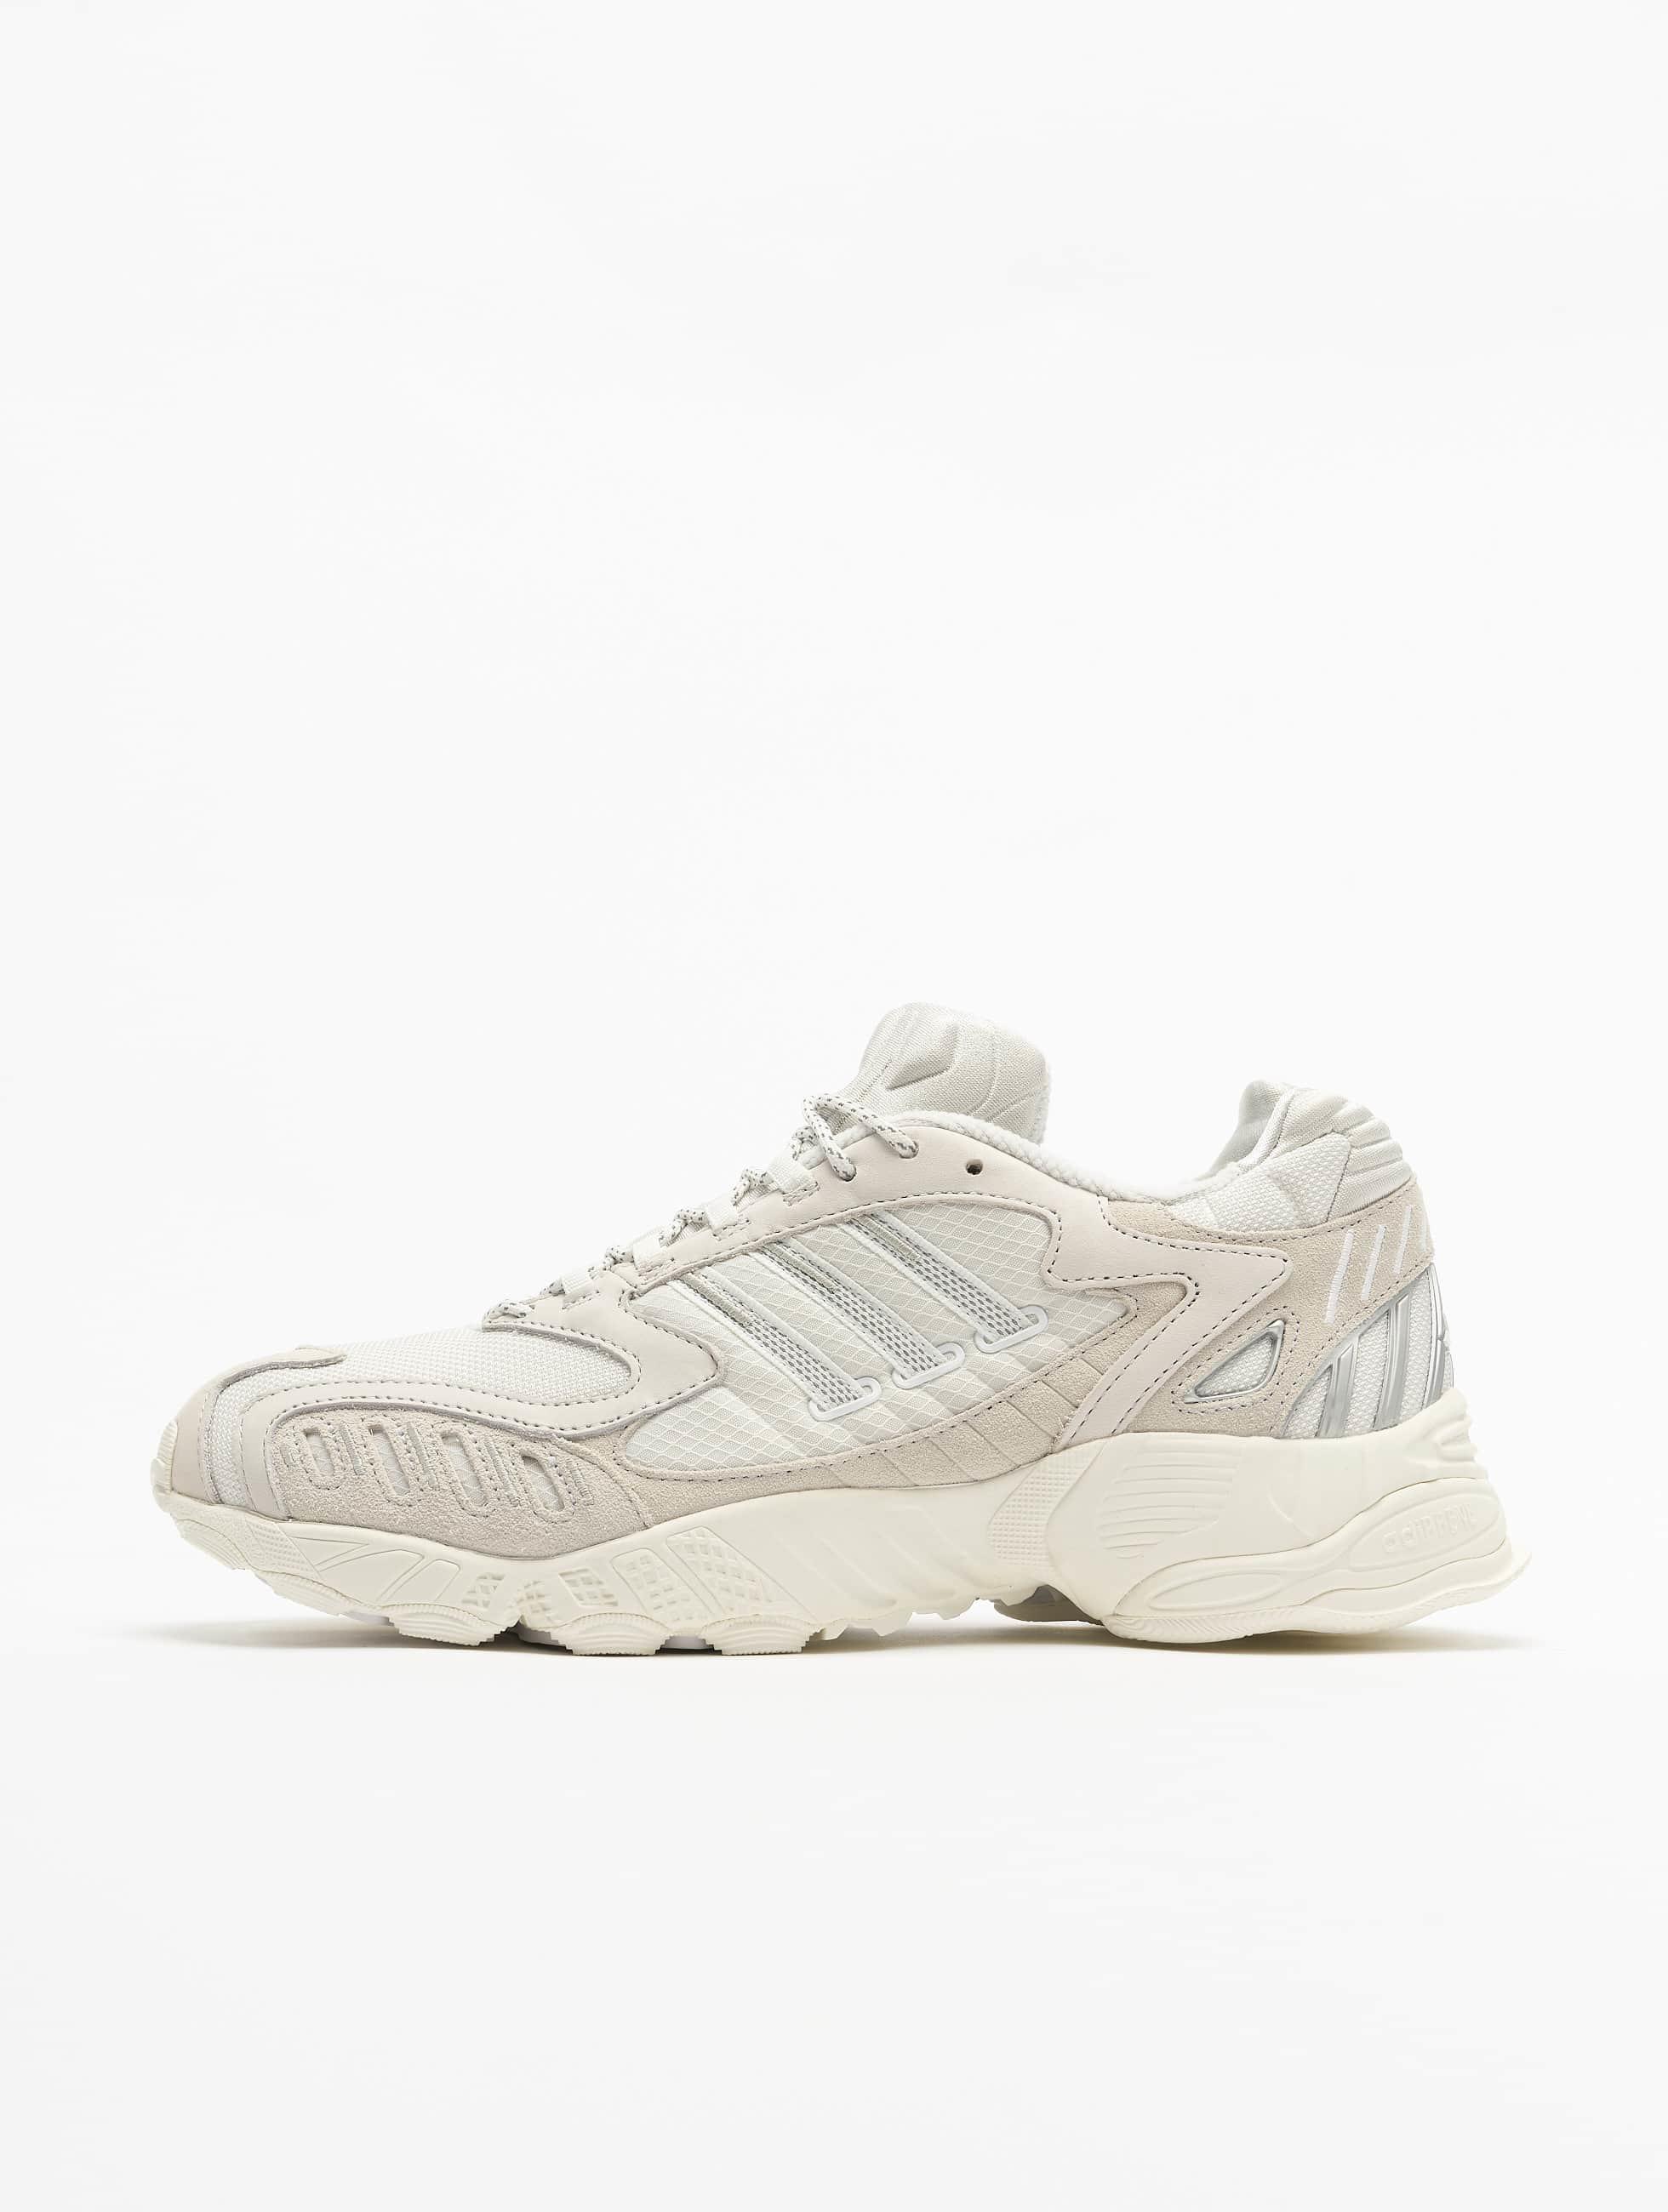 Adidas Originals Torsion TRDC Sneakers Crystal WhiteCrystal WhiteFtwr White